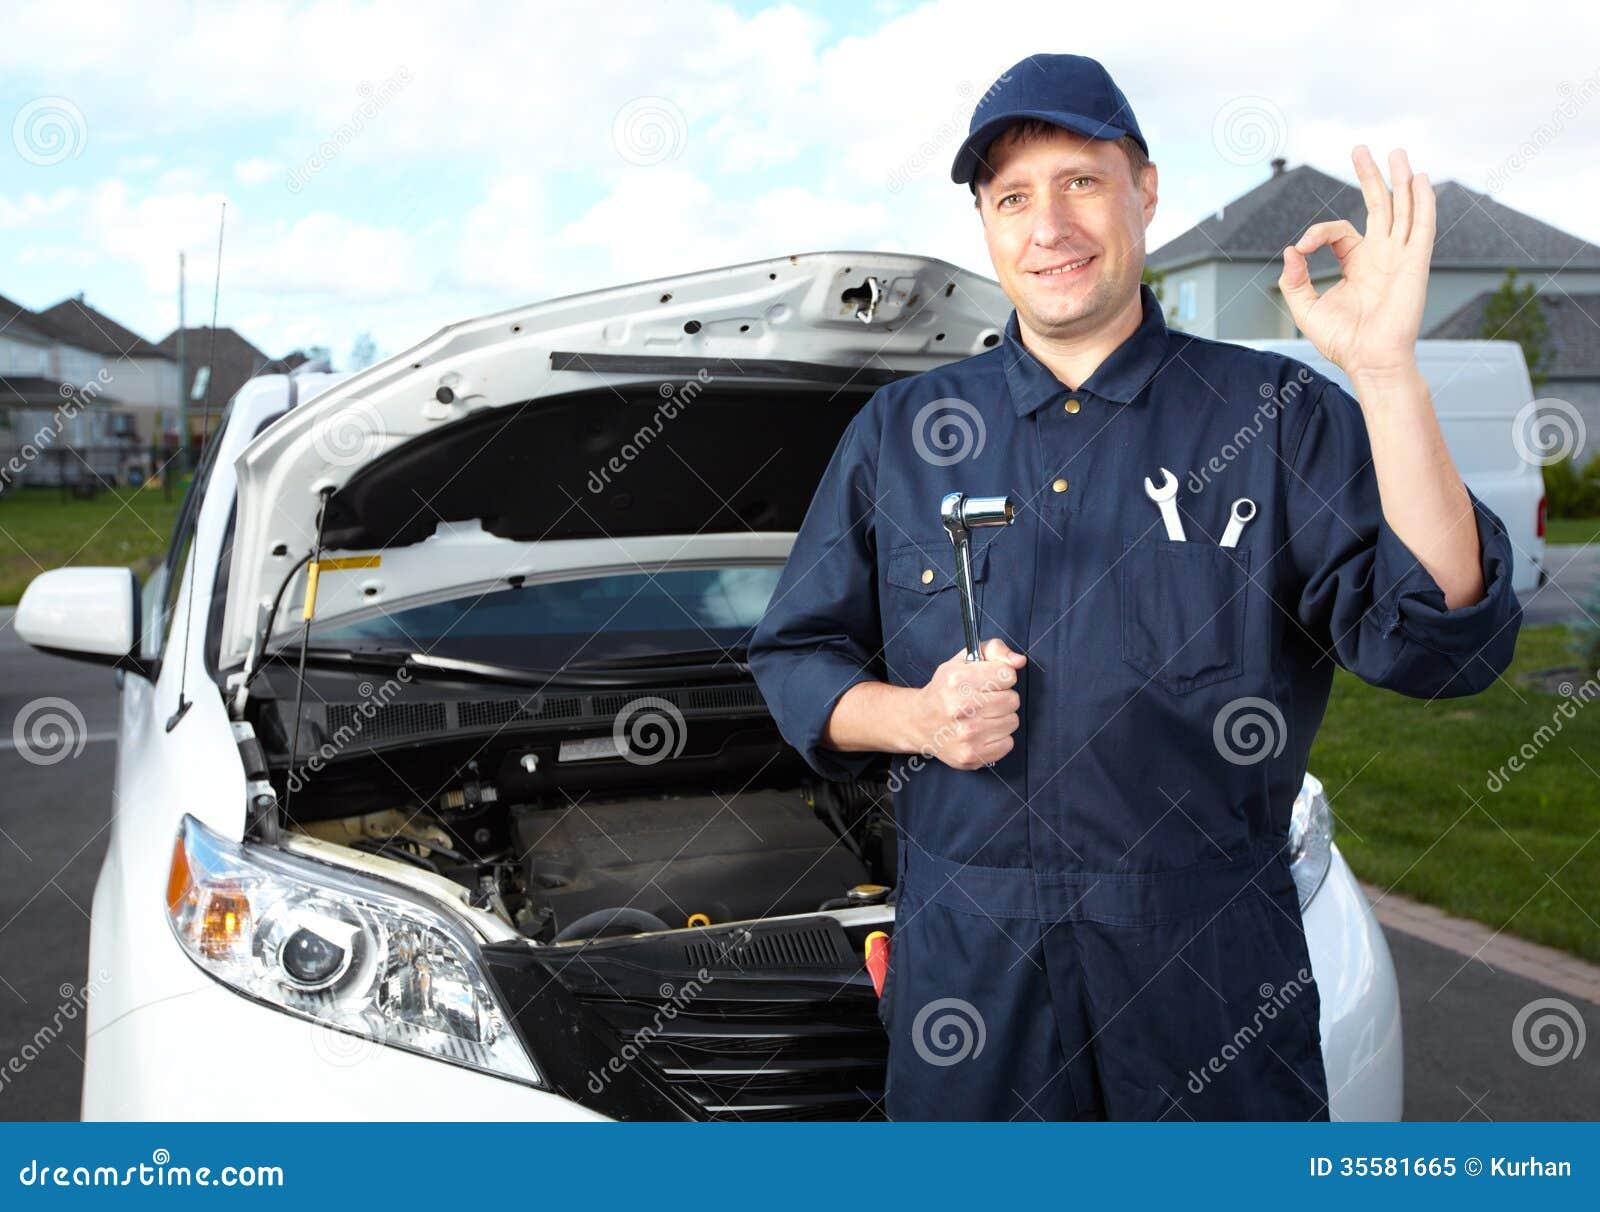 Professional Auto Mechanic. Stock Image - Image of person ...